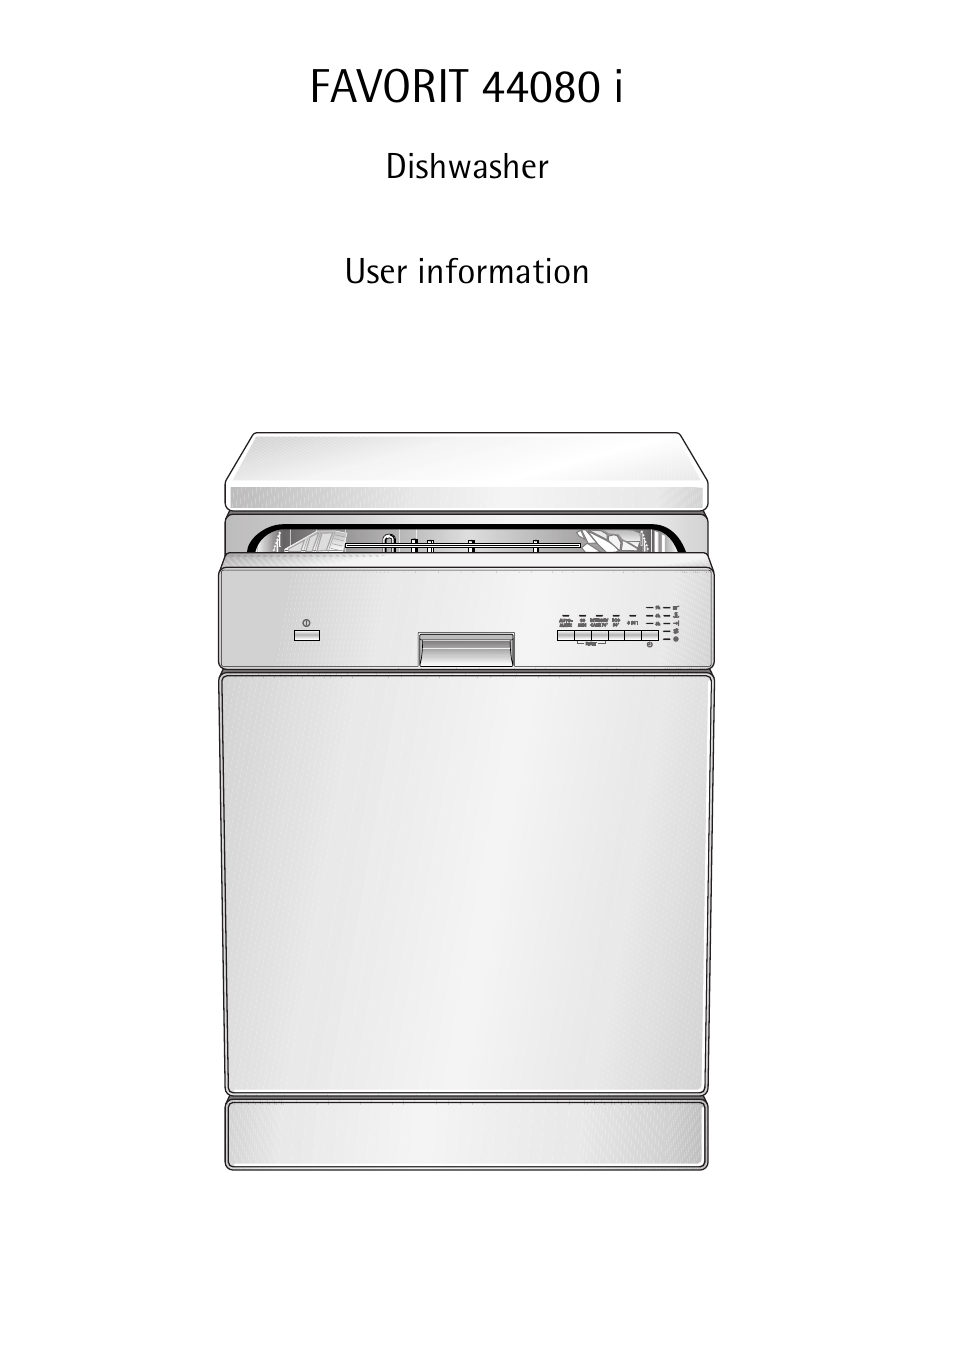 Aeg Favorit 44080 I User Manual 48 Pages